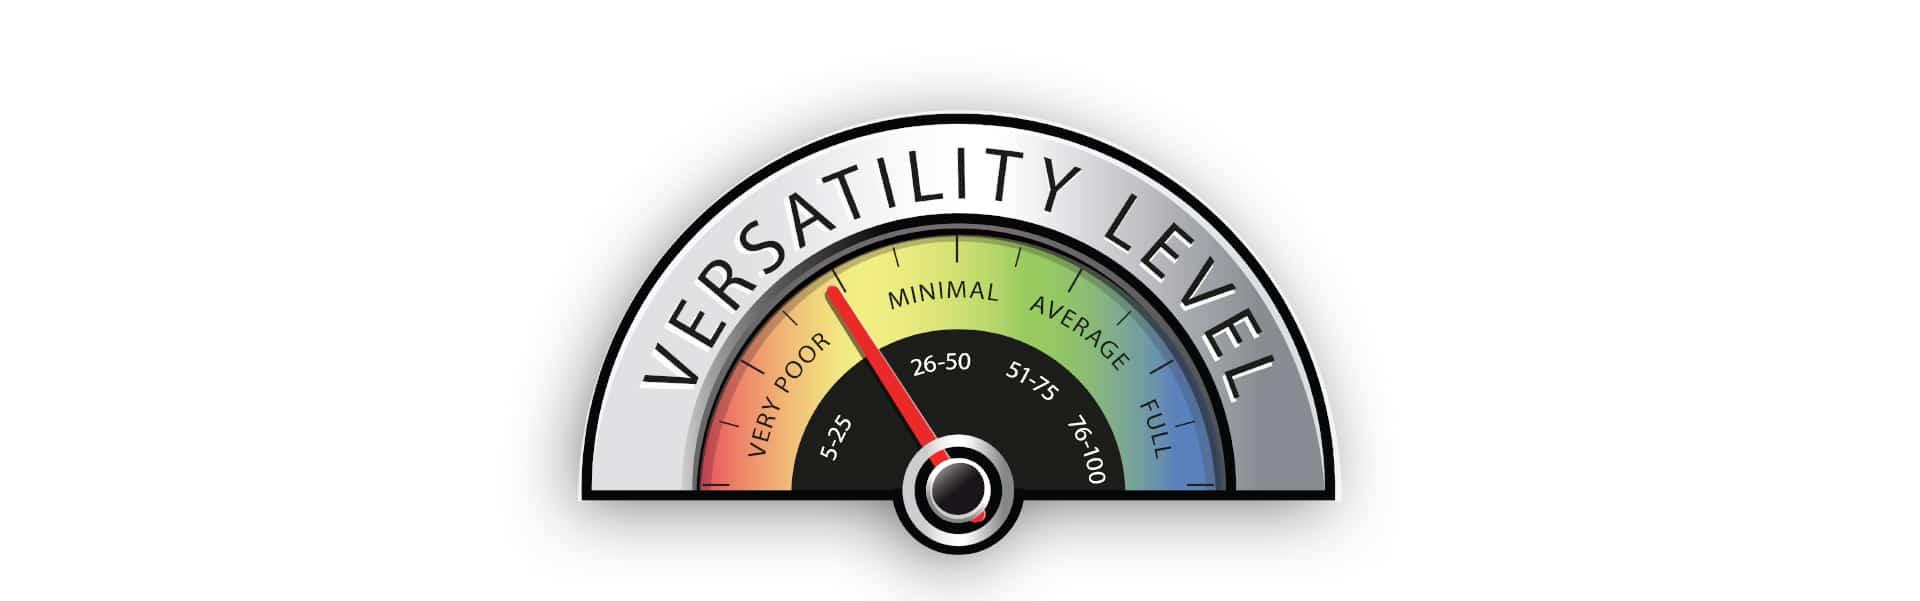 veratility call recording meter final